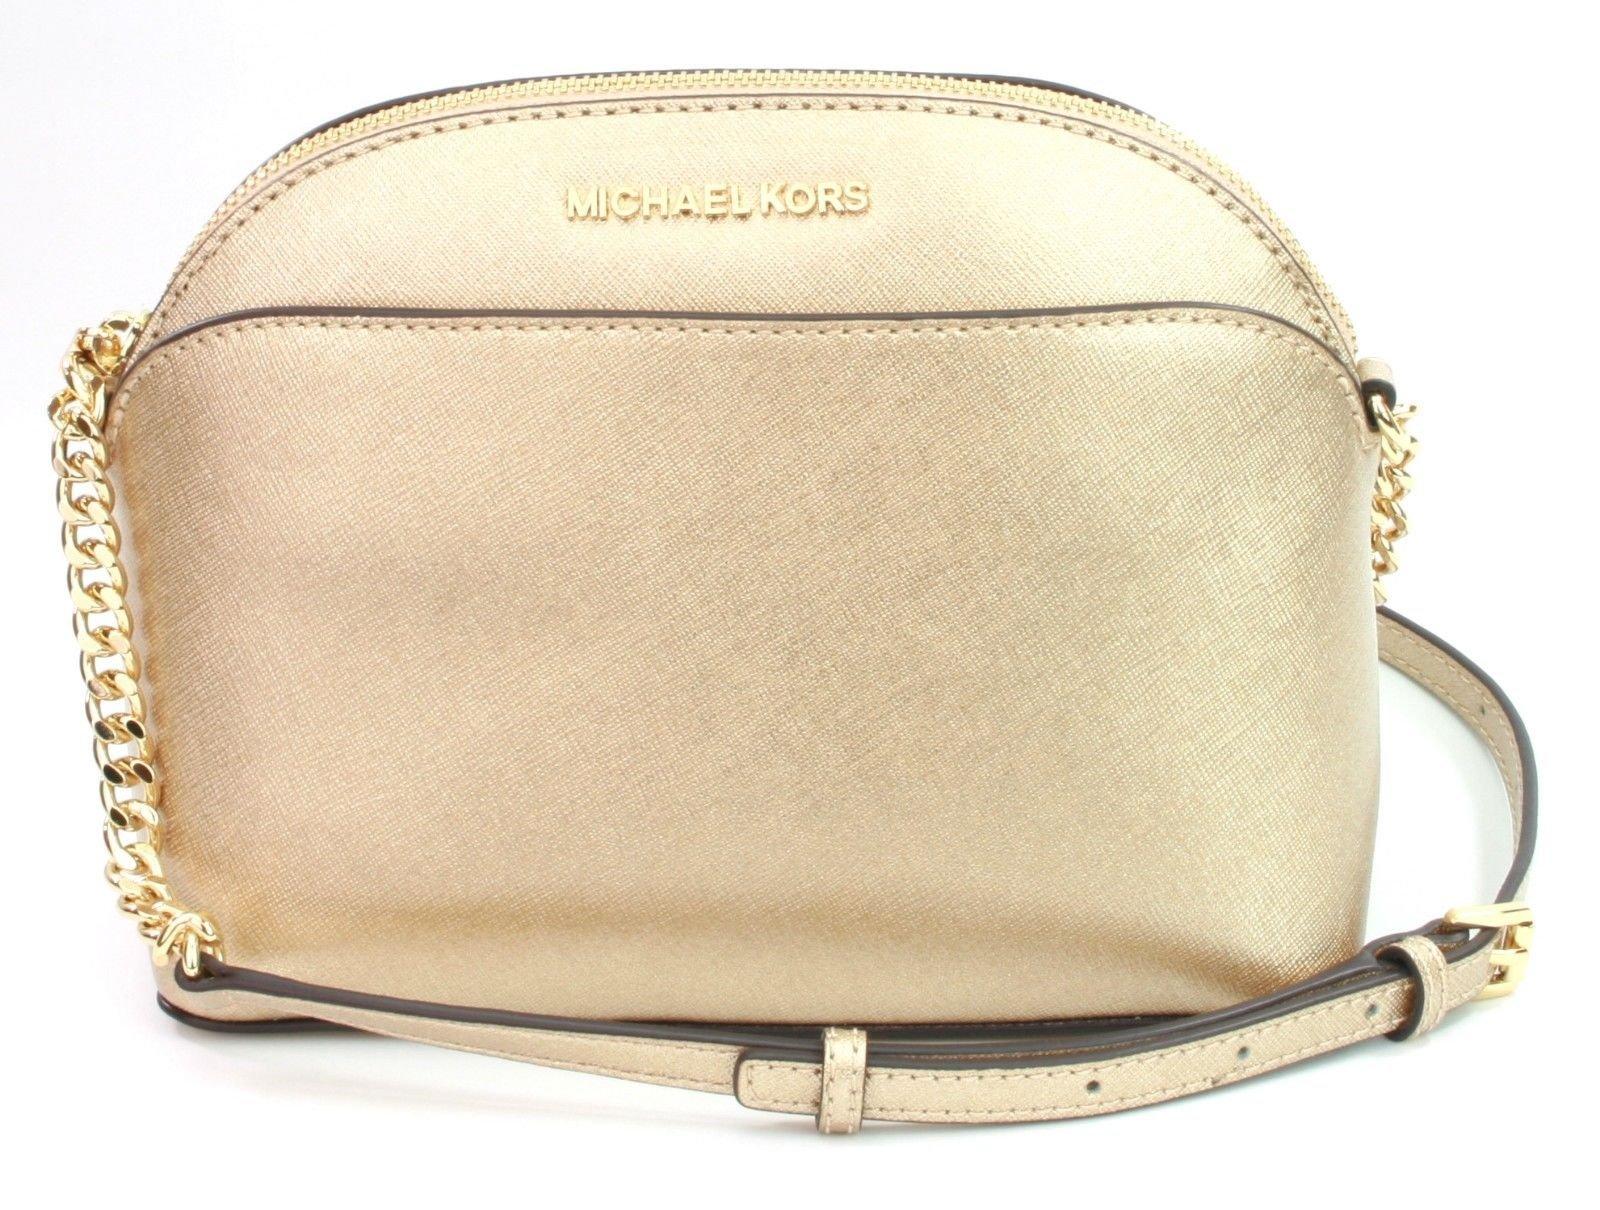 Michael Kors Emmy Saffiano Leather Medium Crossbody Bag in Pale Gold